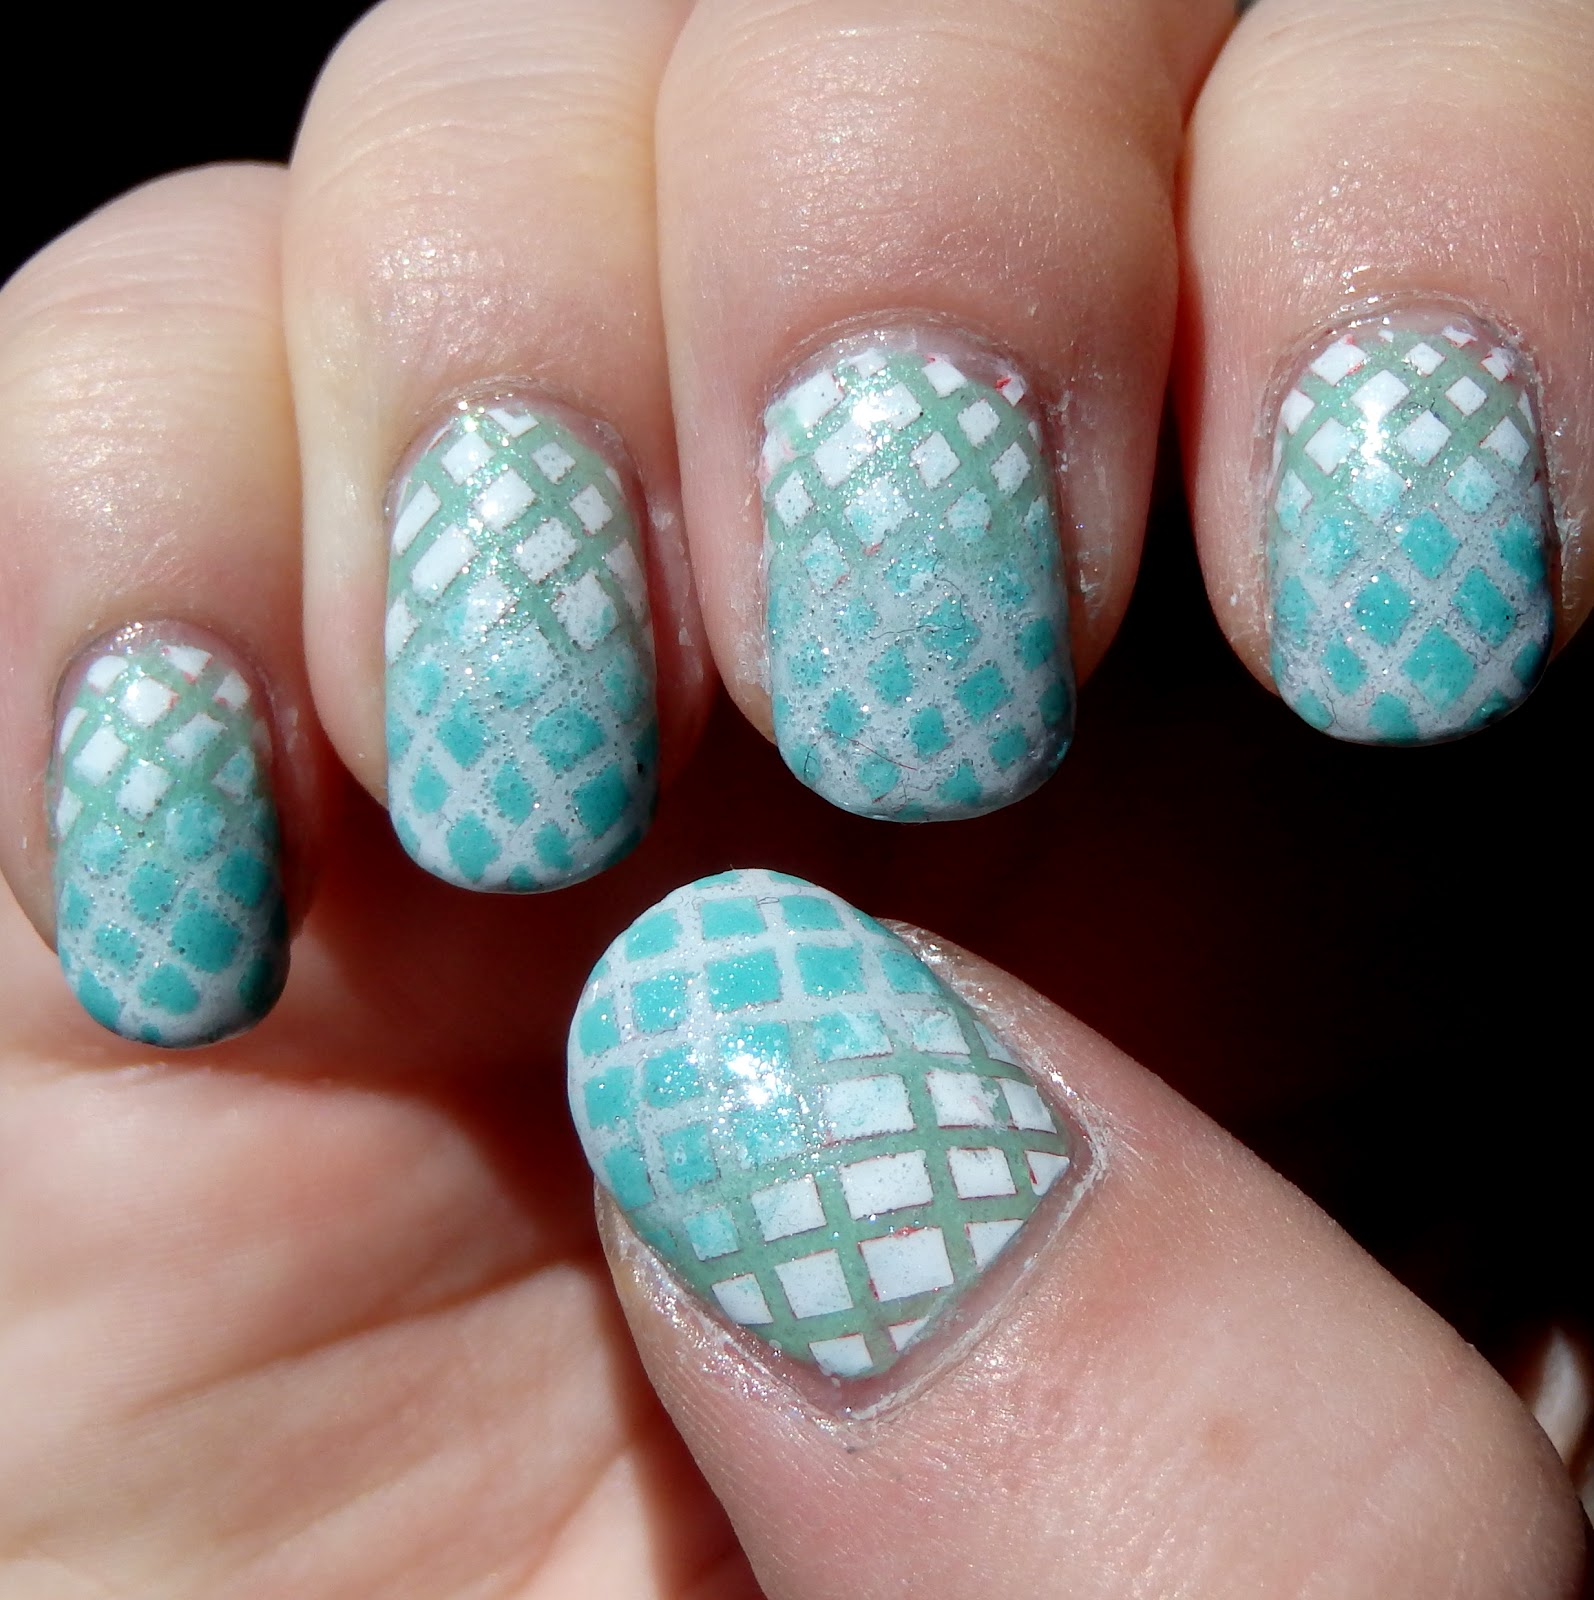 05 13 Minty Criss Cross Nails